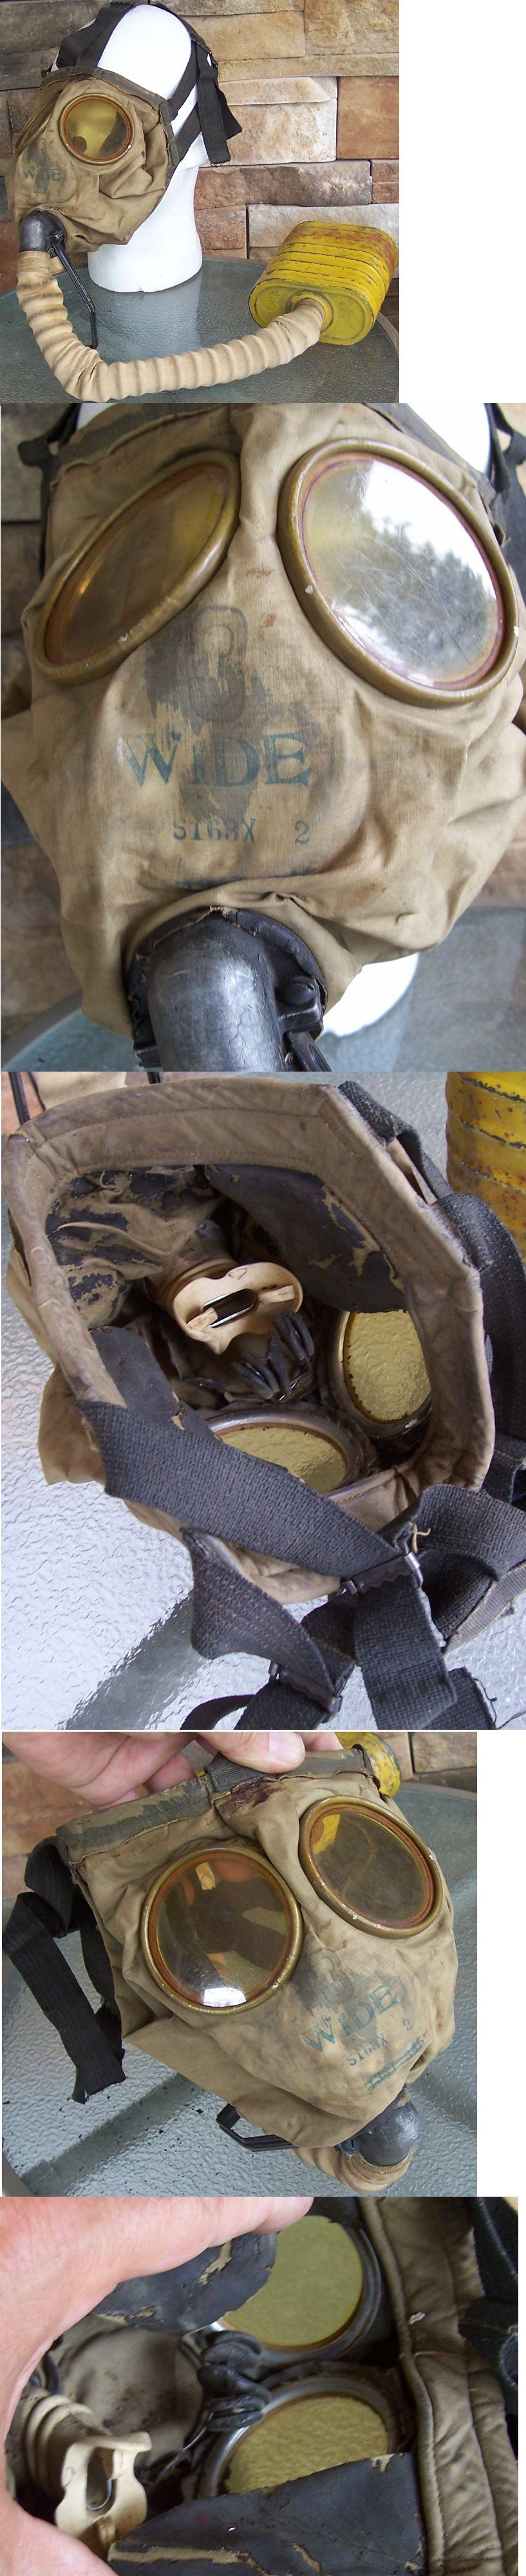 US WWII Vintage Gas Mask